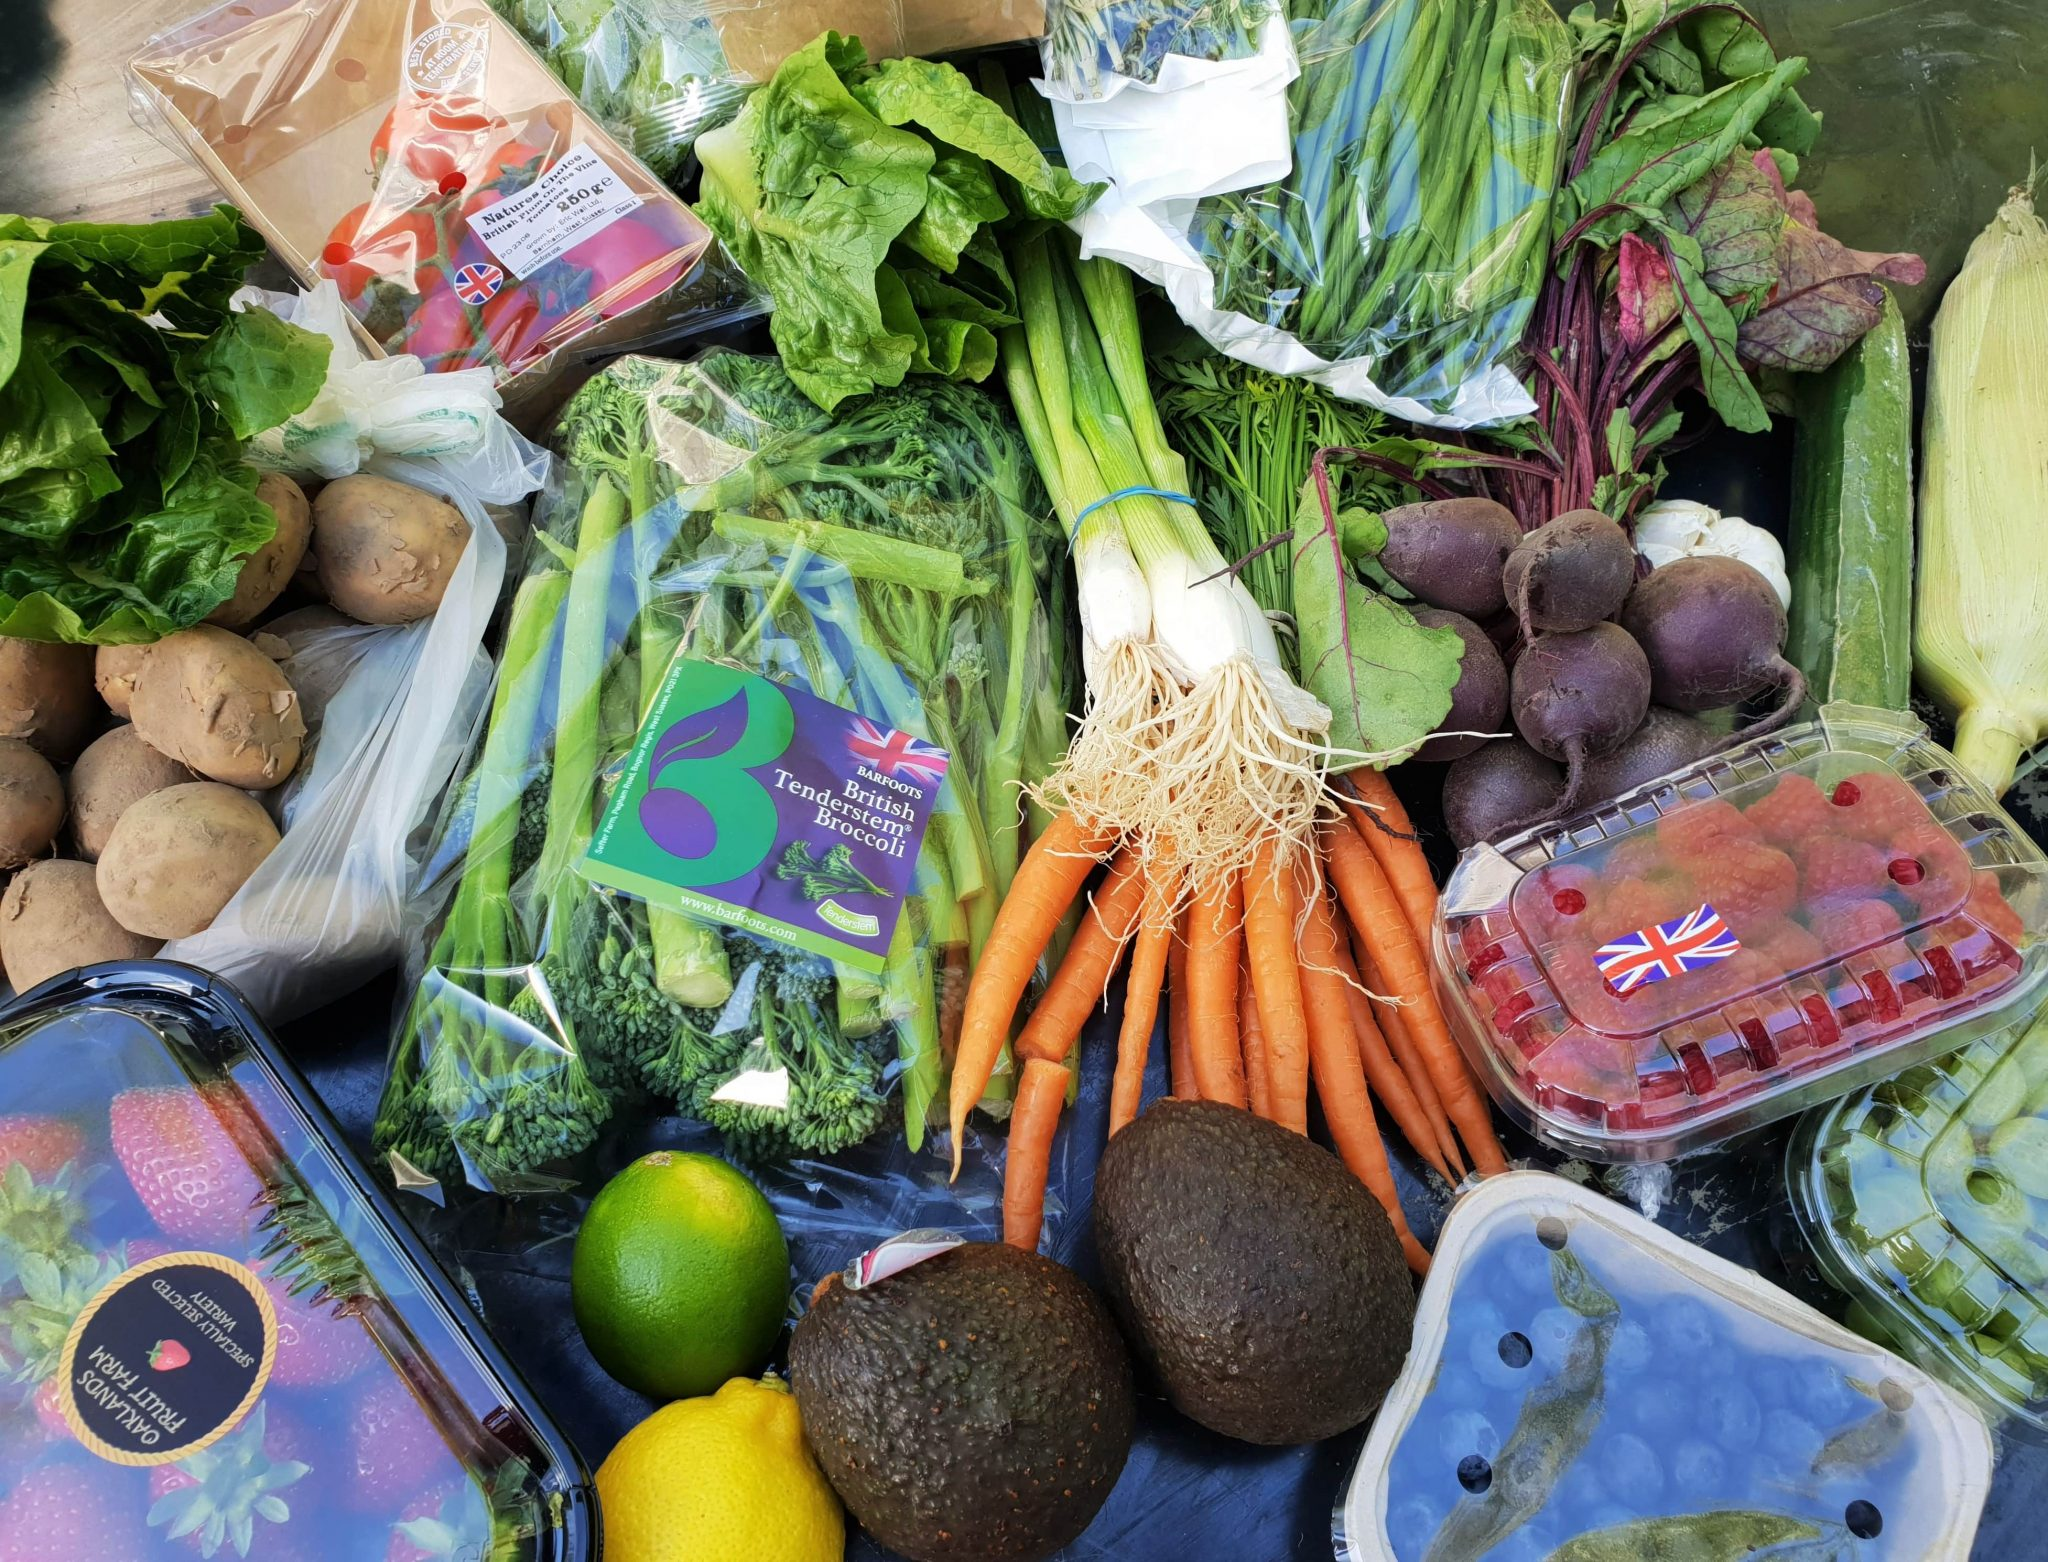 Nature's Choice veg box